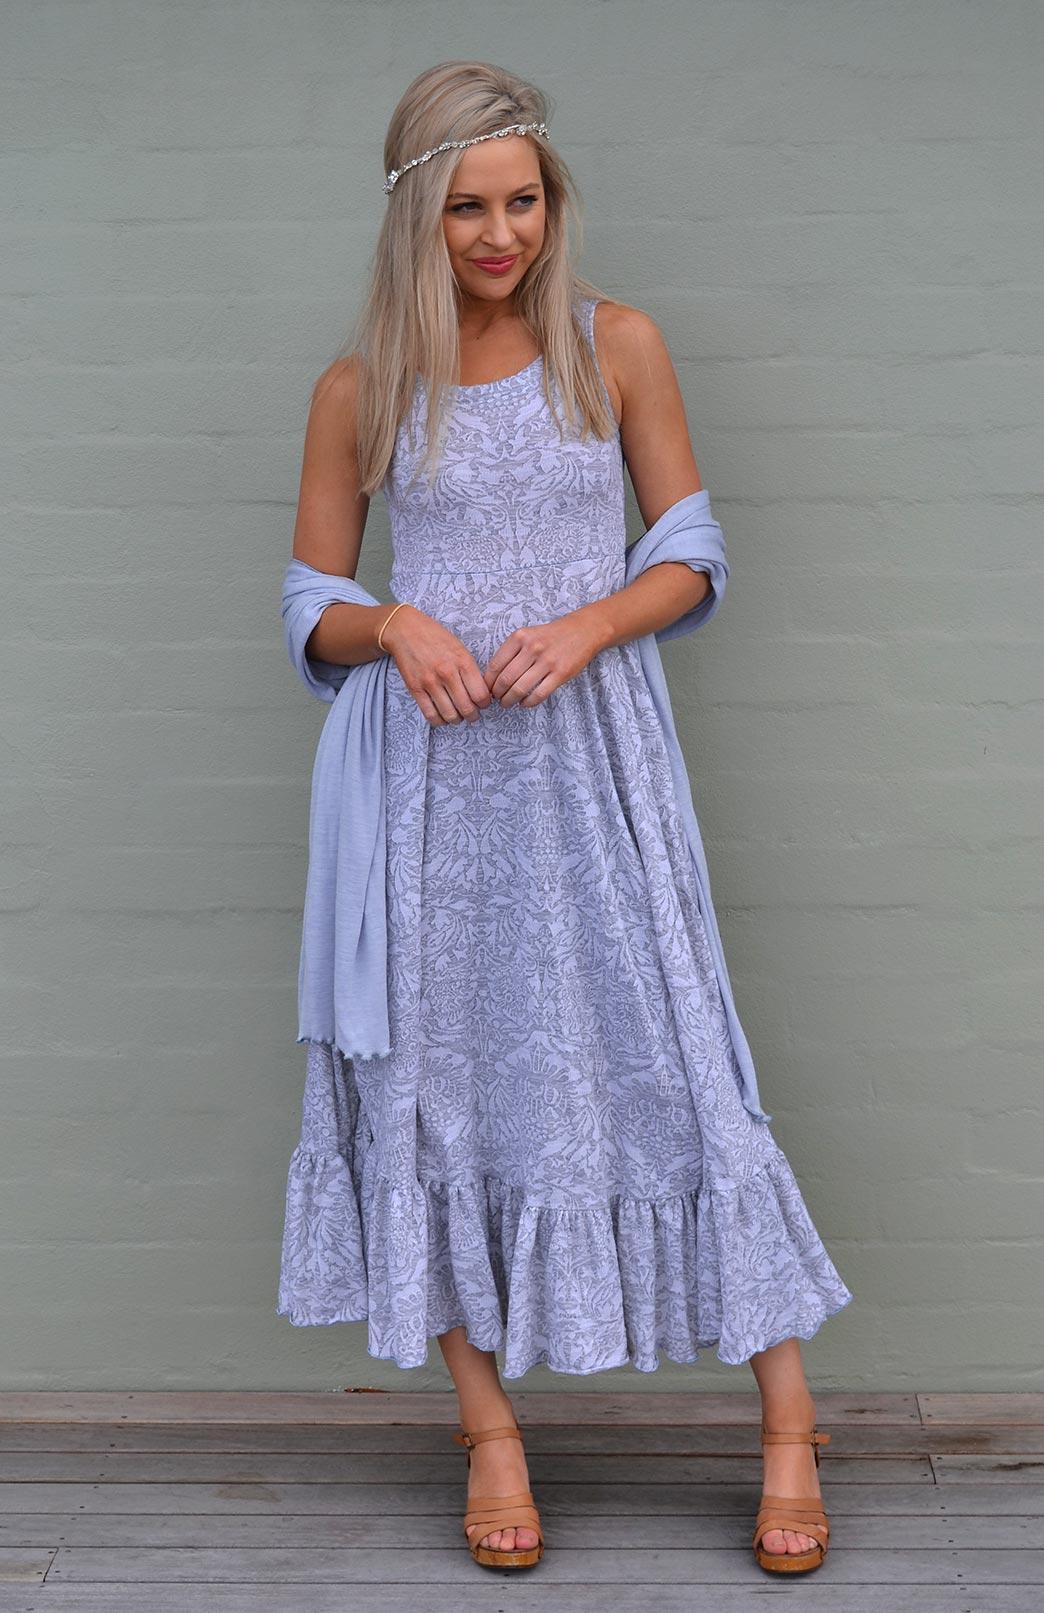 Fleur Maxi Dress - Women's Soft Grey and White Floral Merino Wool Sleeveless Summer Maxi Dress - Smitten Merino Tasmania Australia